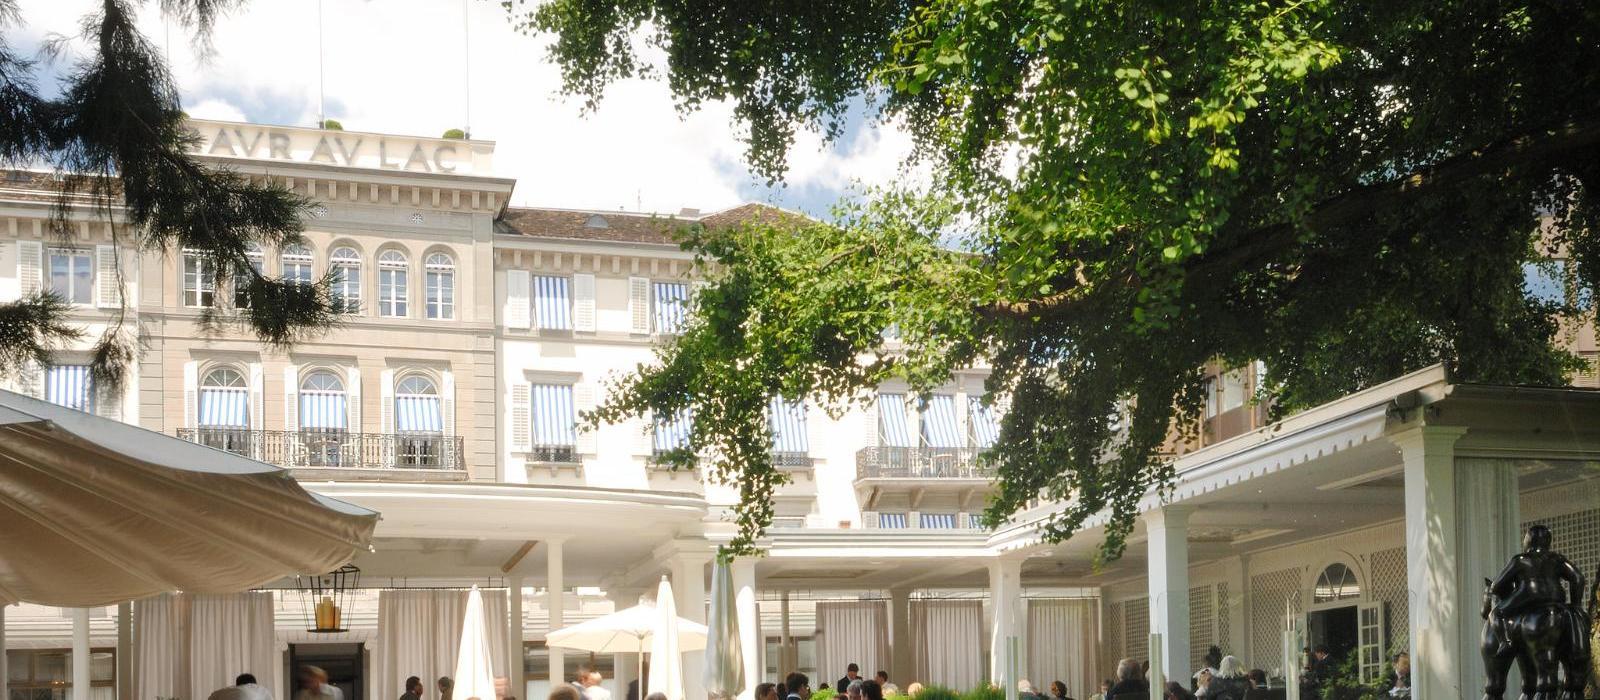 博安湖畔酒店(Baur Au Lac) 图片  www.lhw.cn